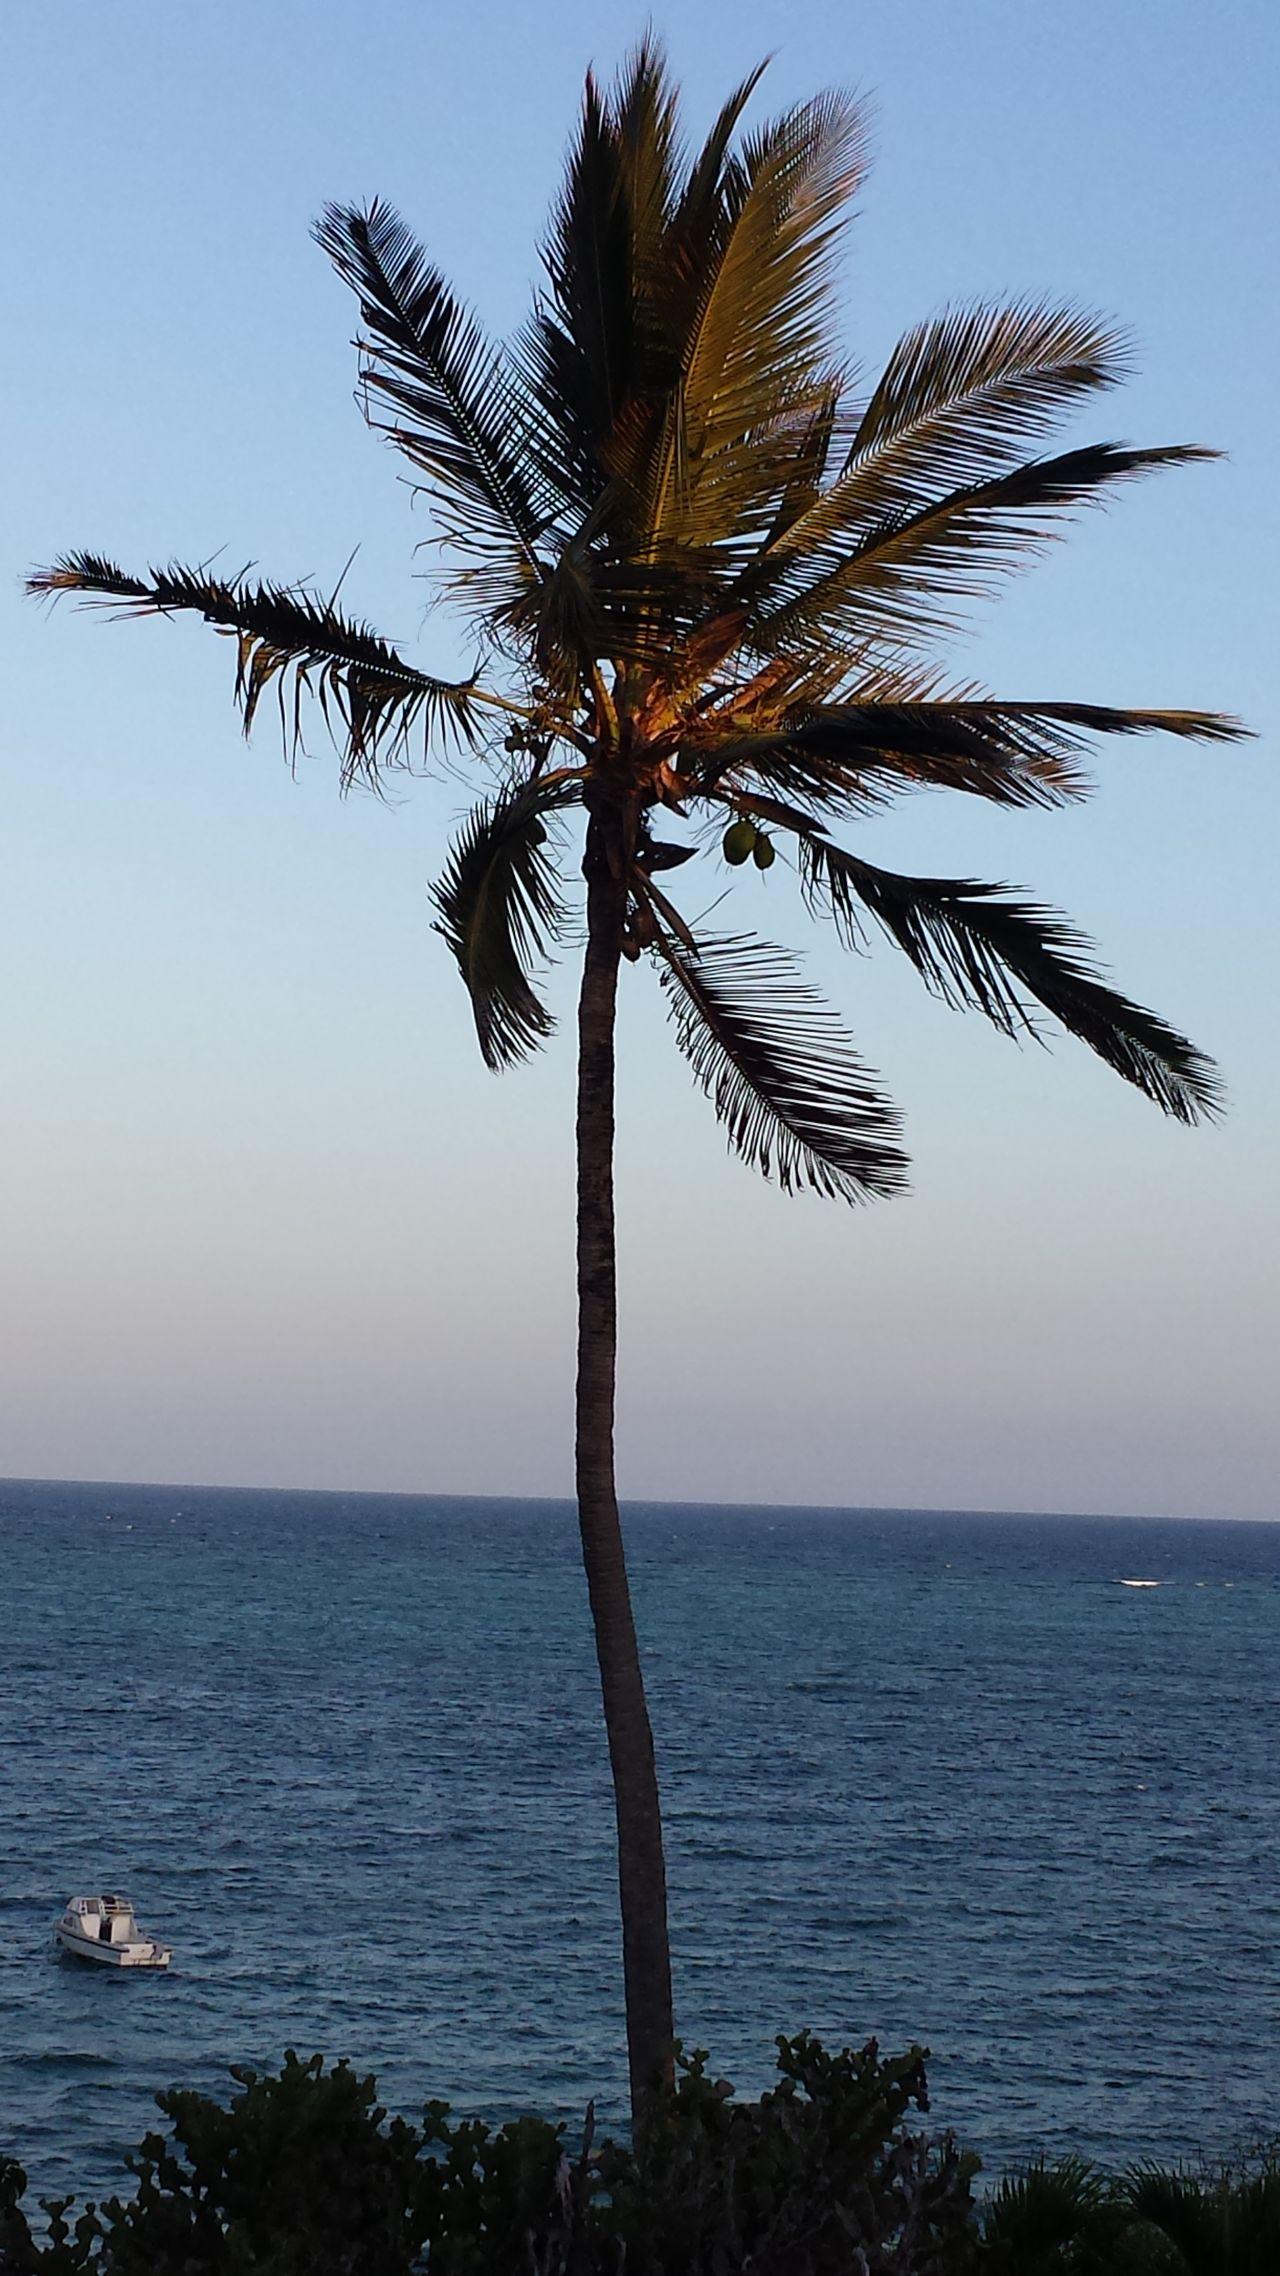 Kenya,Africa Water Landscape Sky Day Nature No People Ocean Beauty In Nature Palm Tree Blue Sky Kenya Traveling Africa Bluecolor